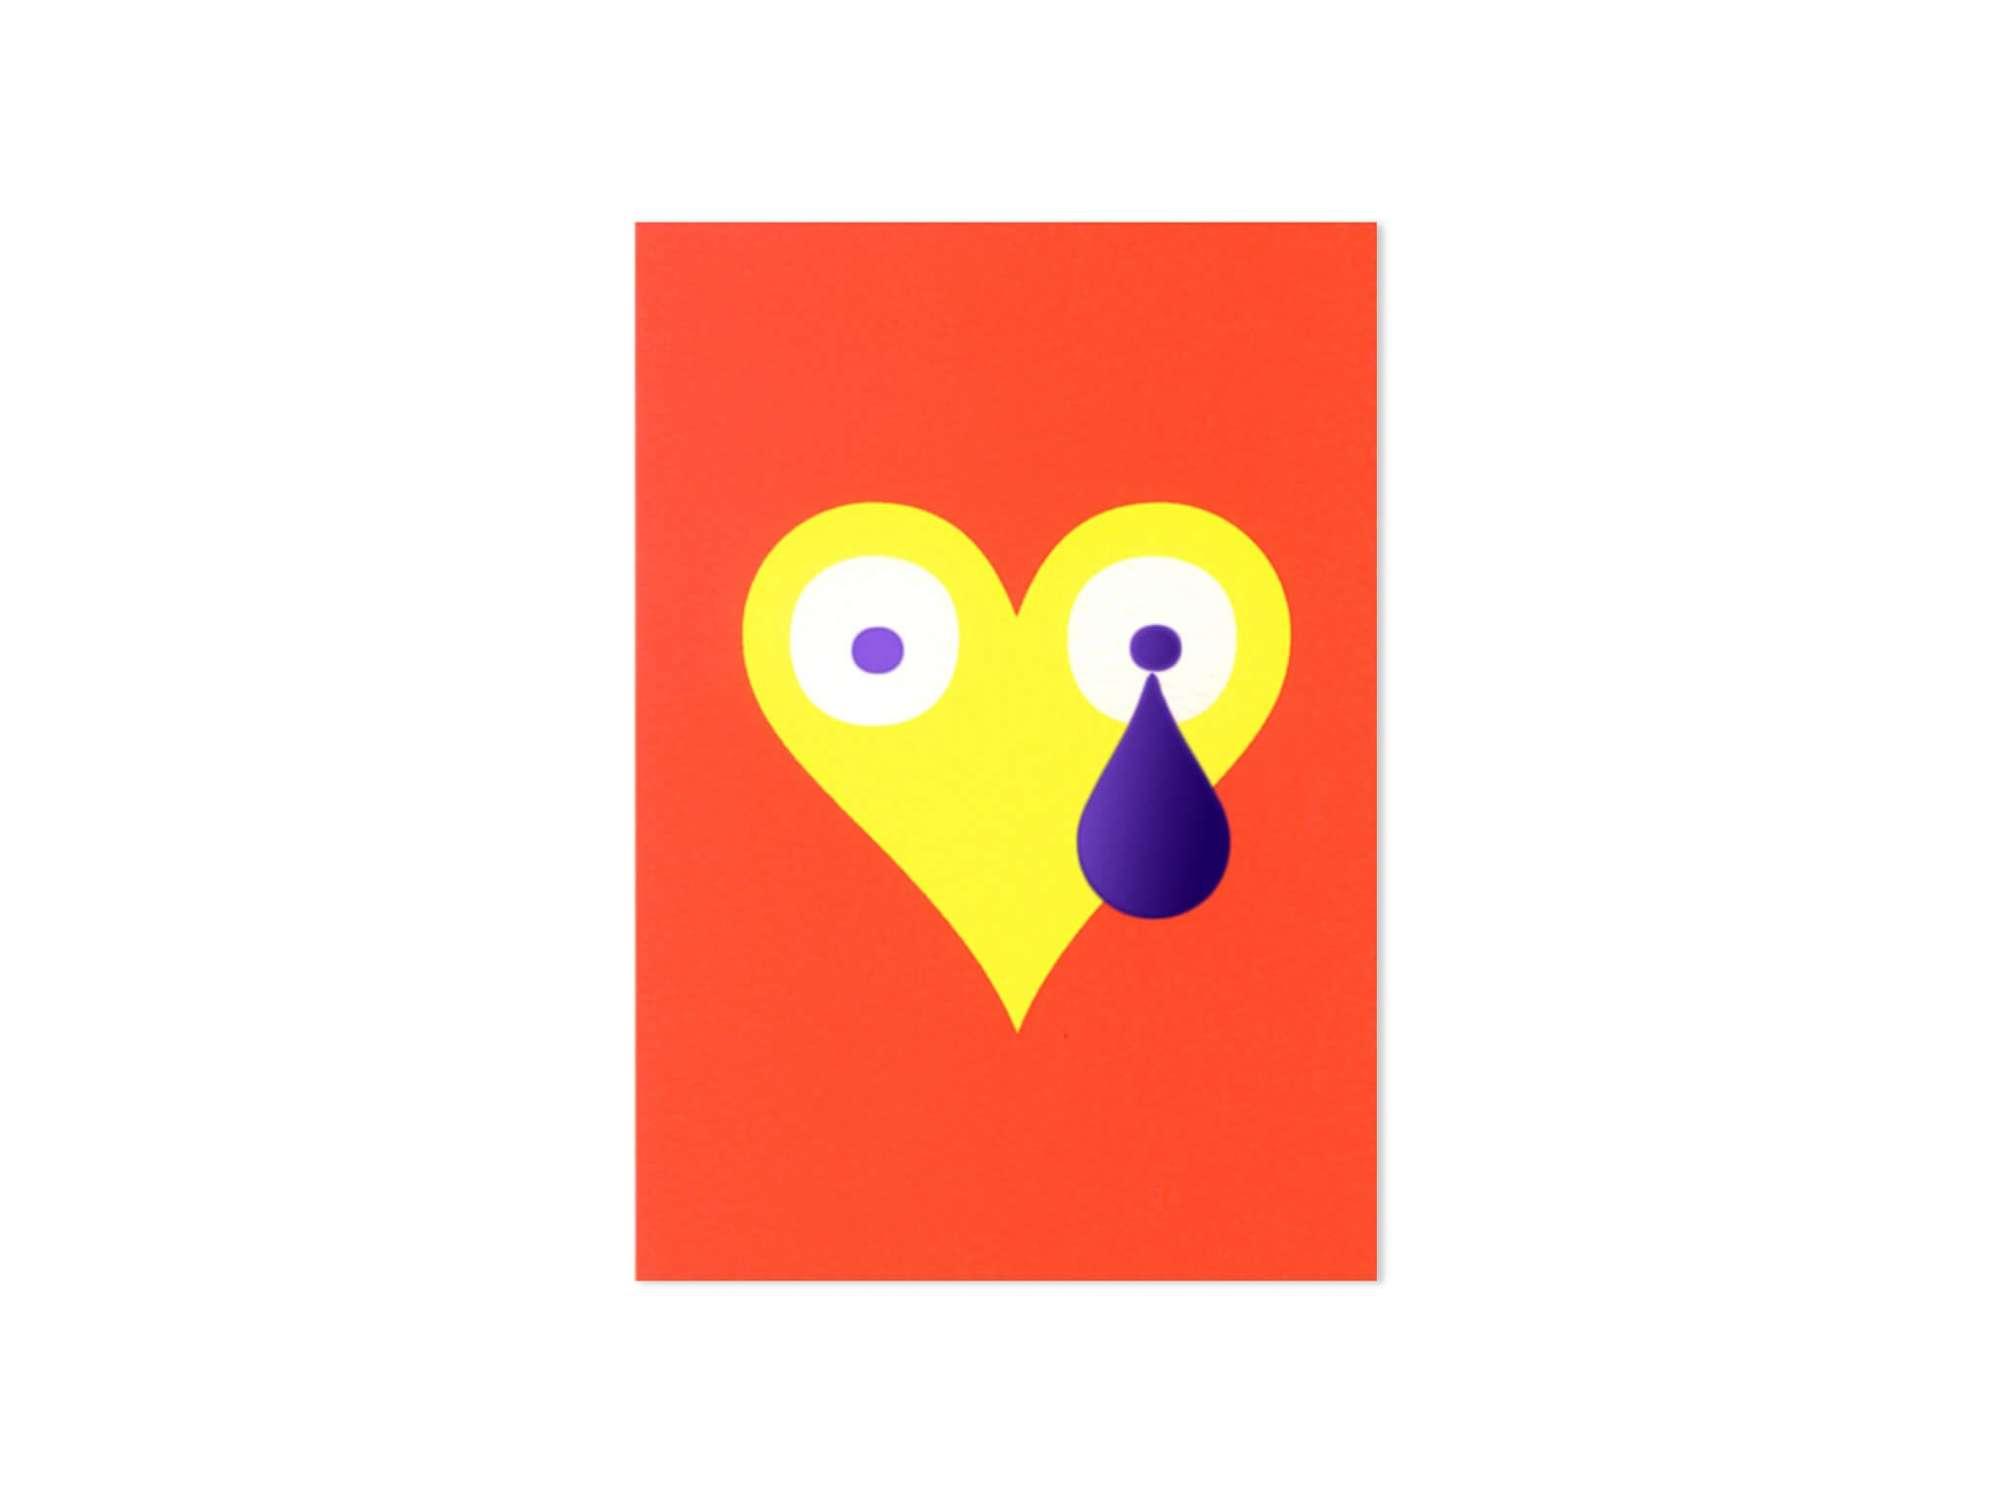 Carte coeur. Leitmotiv d'Ich&Kar, émotion, émoi, love love love romantisme absolu.